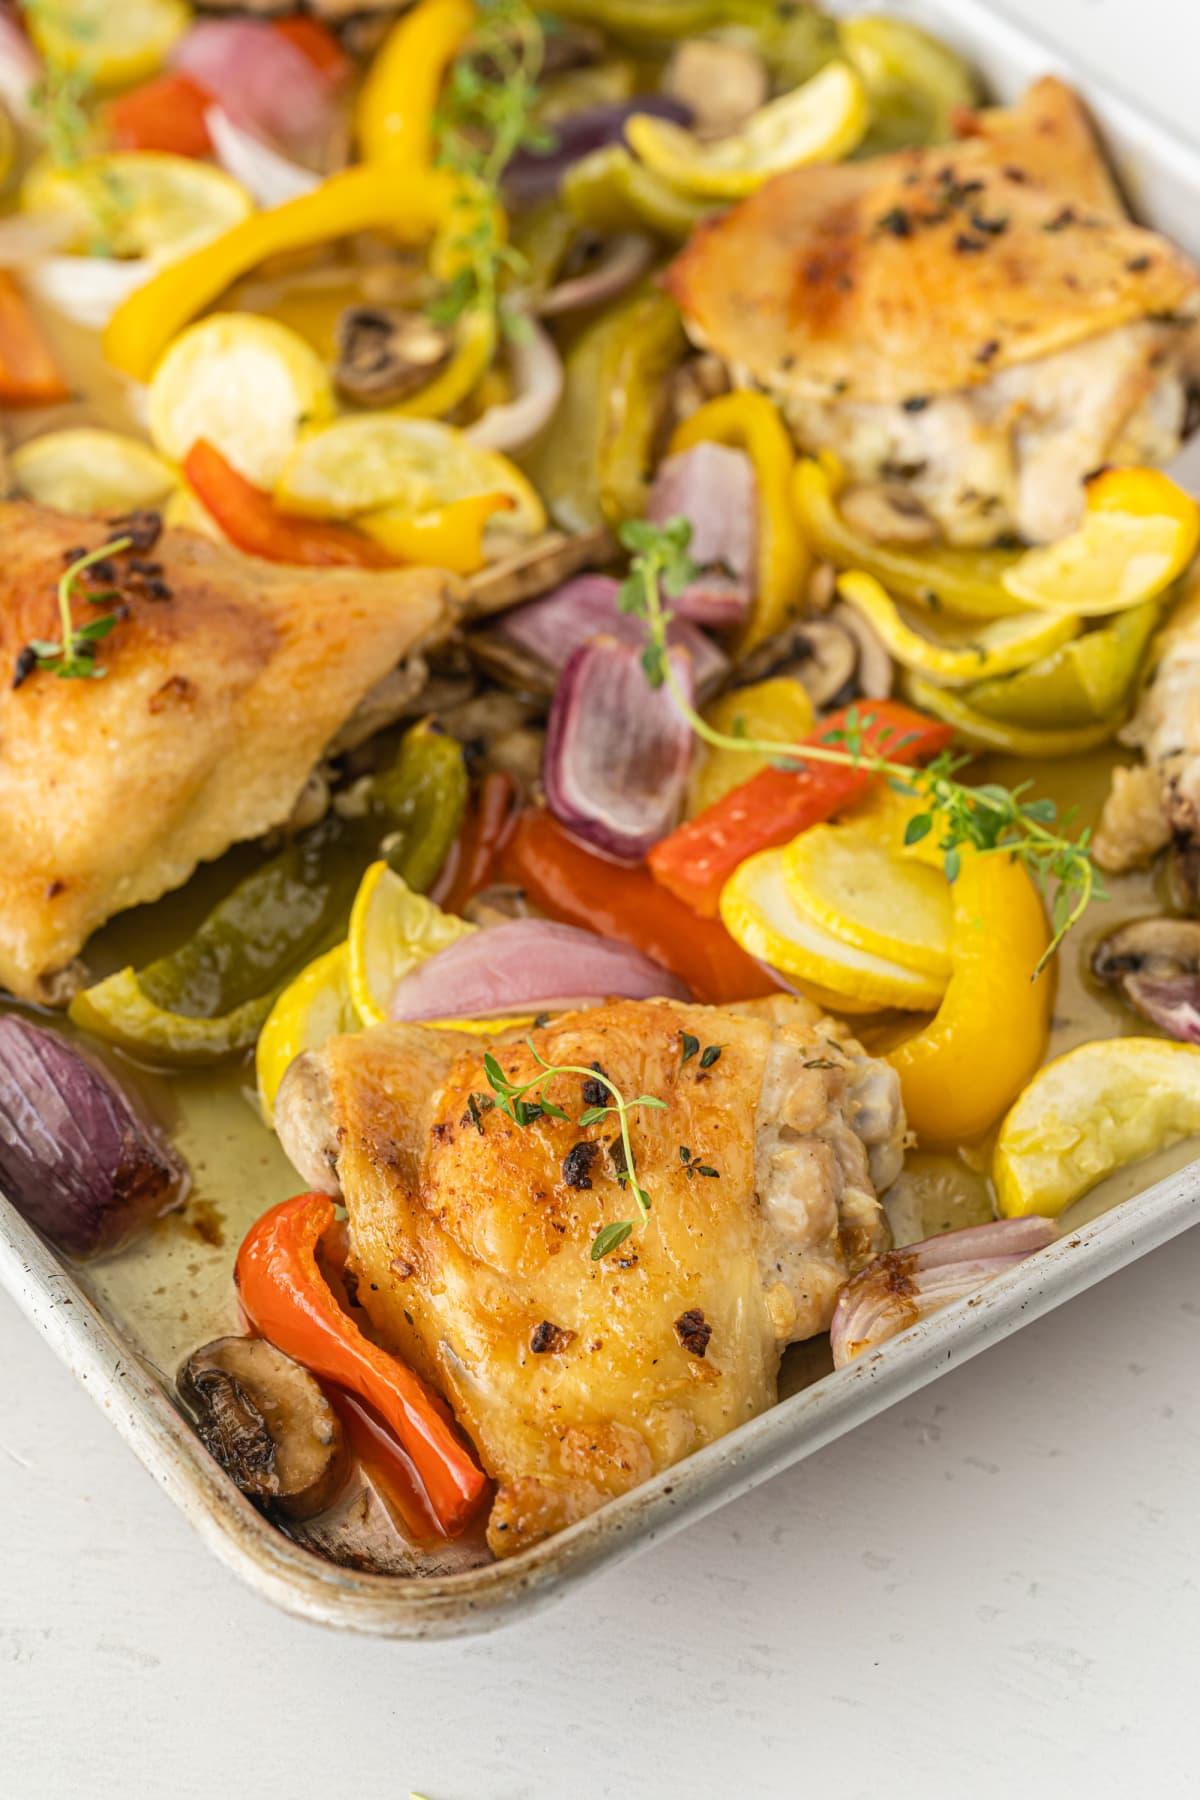 Sheet Pan Chicken And Veggies Recipe